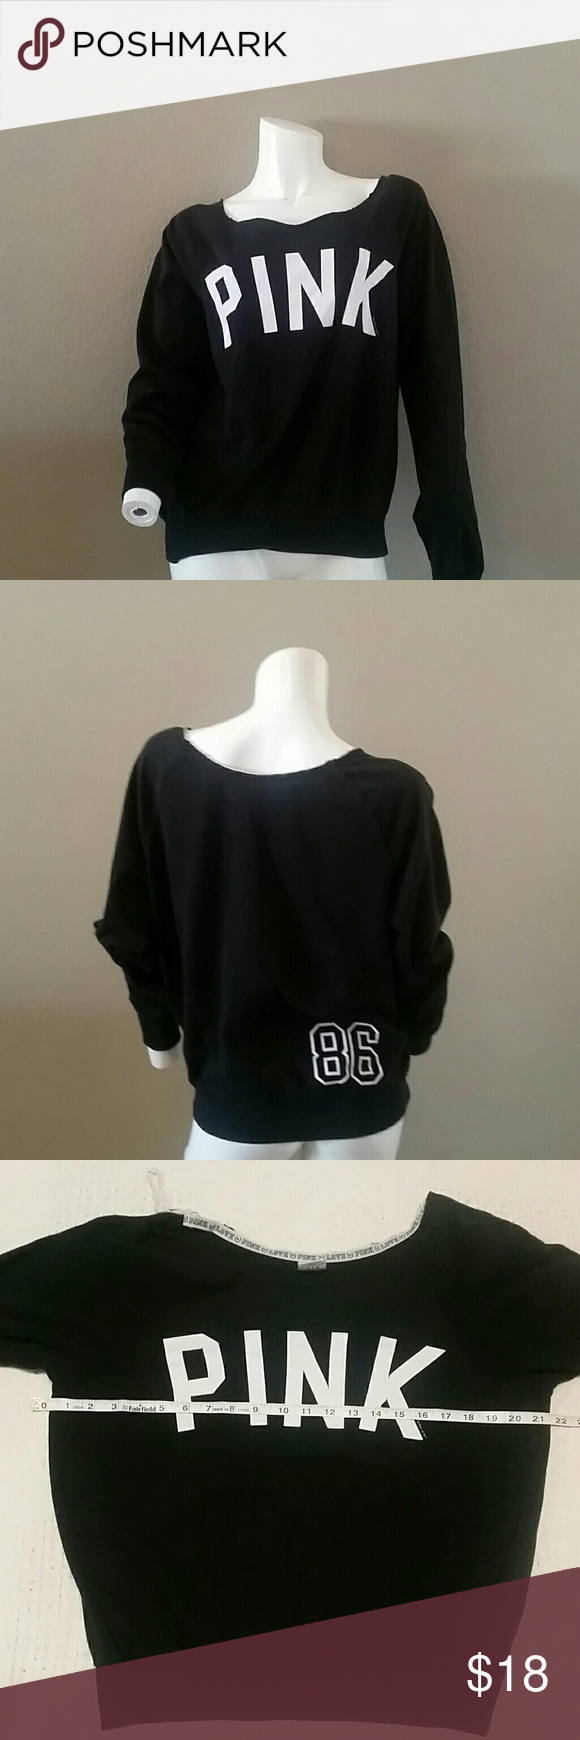 2f55c1a32d06 Victoria s secret Pink sweatshirt small Small Black sweatshirt